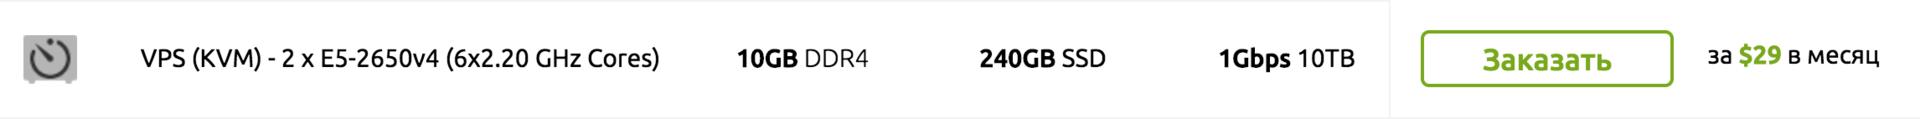 Чёрные серверы в Нидерландах с чёрной пятницы (предзаказ): 6х2.20GHz 10GB DDR4 240GB SSD 1Gbps 10TB — $29 - месяц - 8